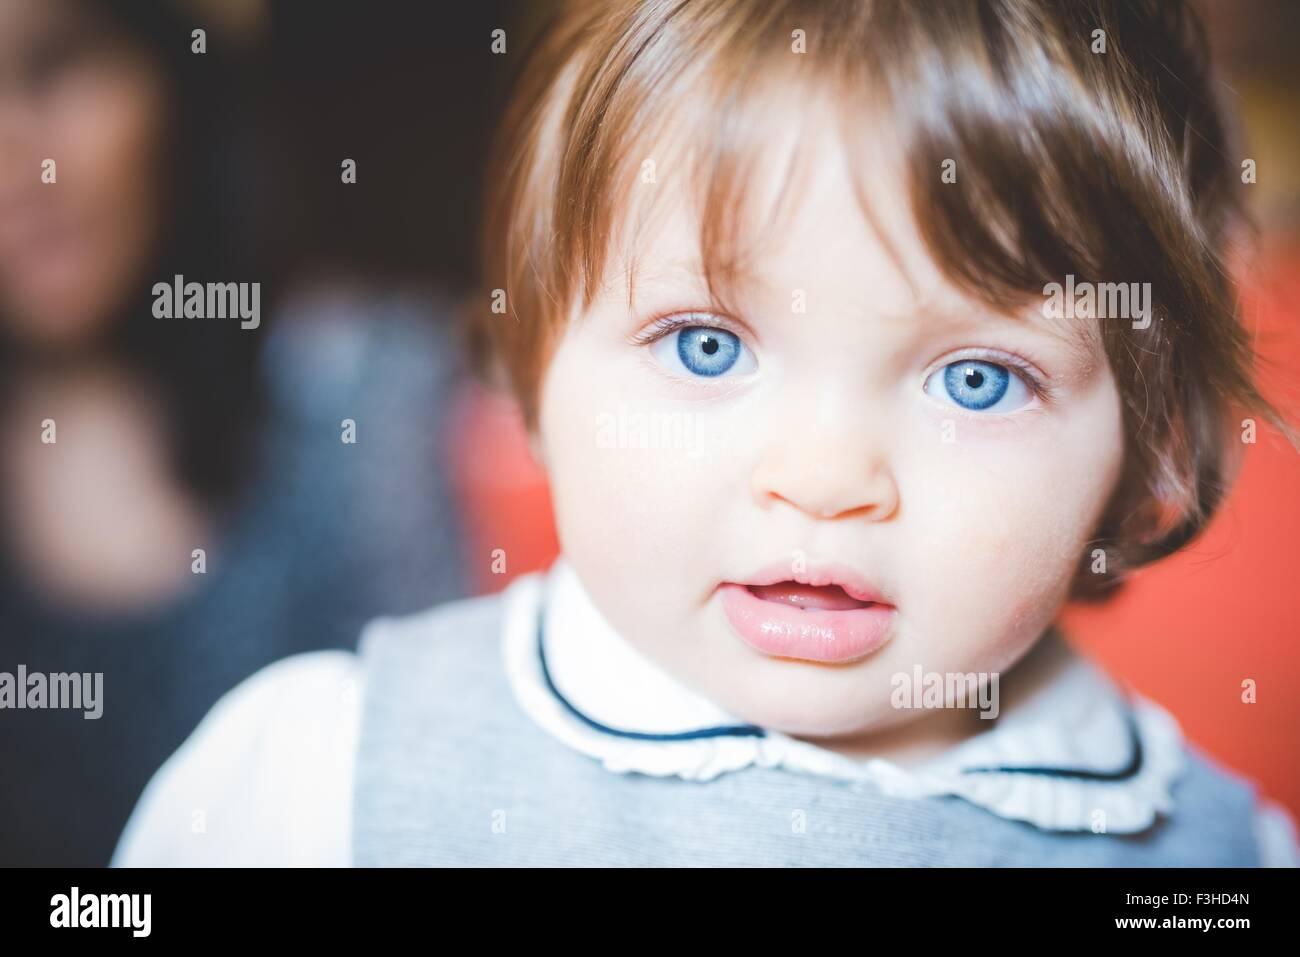 Close Up retrato de mujer niño con ojos azules Imagen De Stock